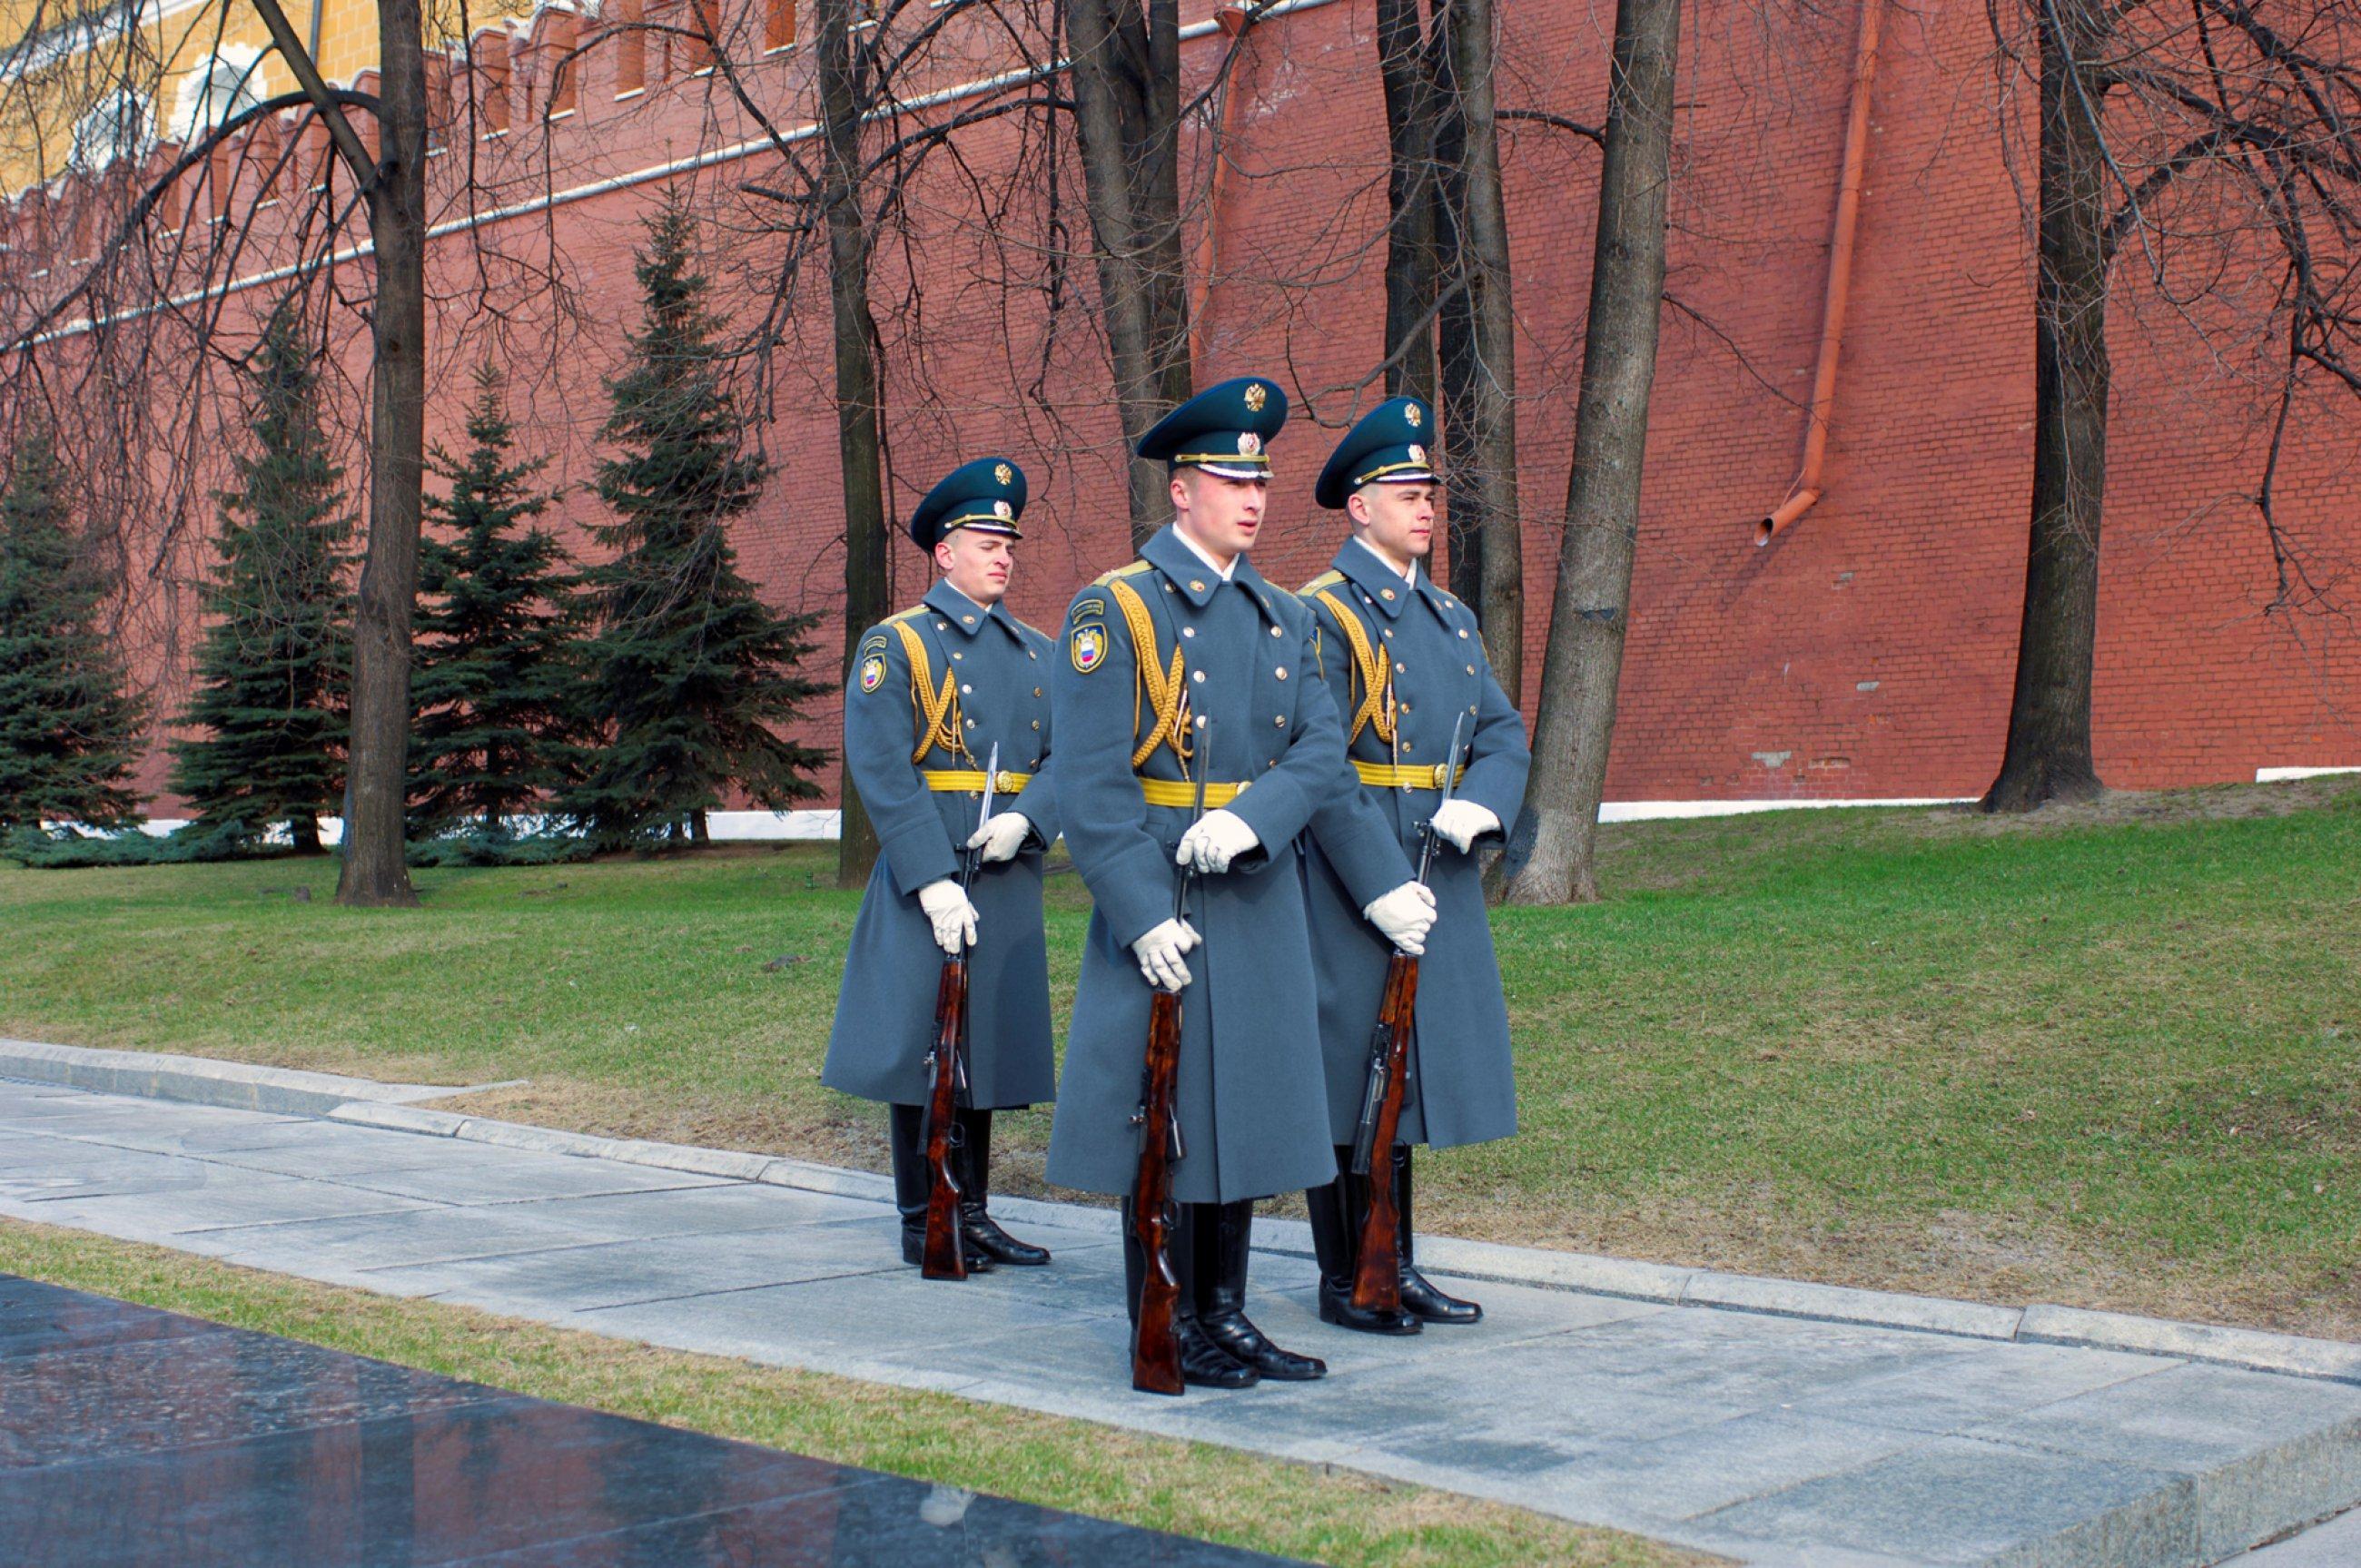 https://bubo.sk/uploads/galleries/5055/kremlin-regiment-changing-of-the-guard-moscow-2007-07.jpg